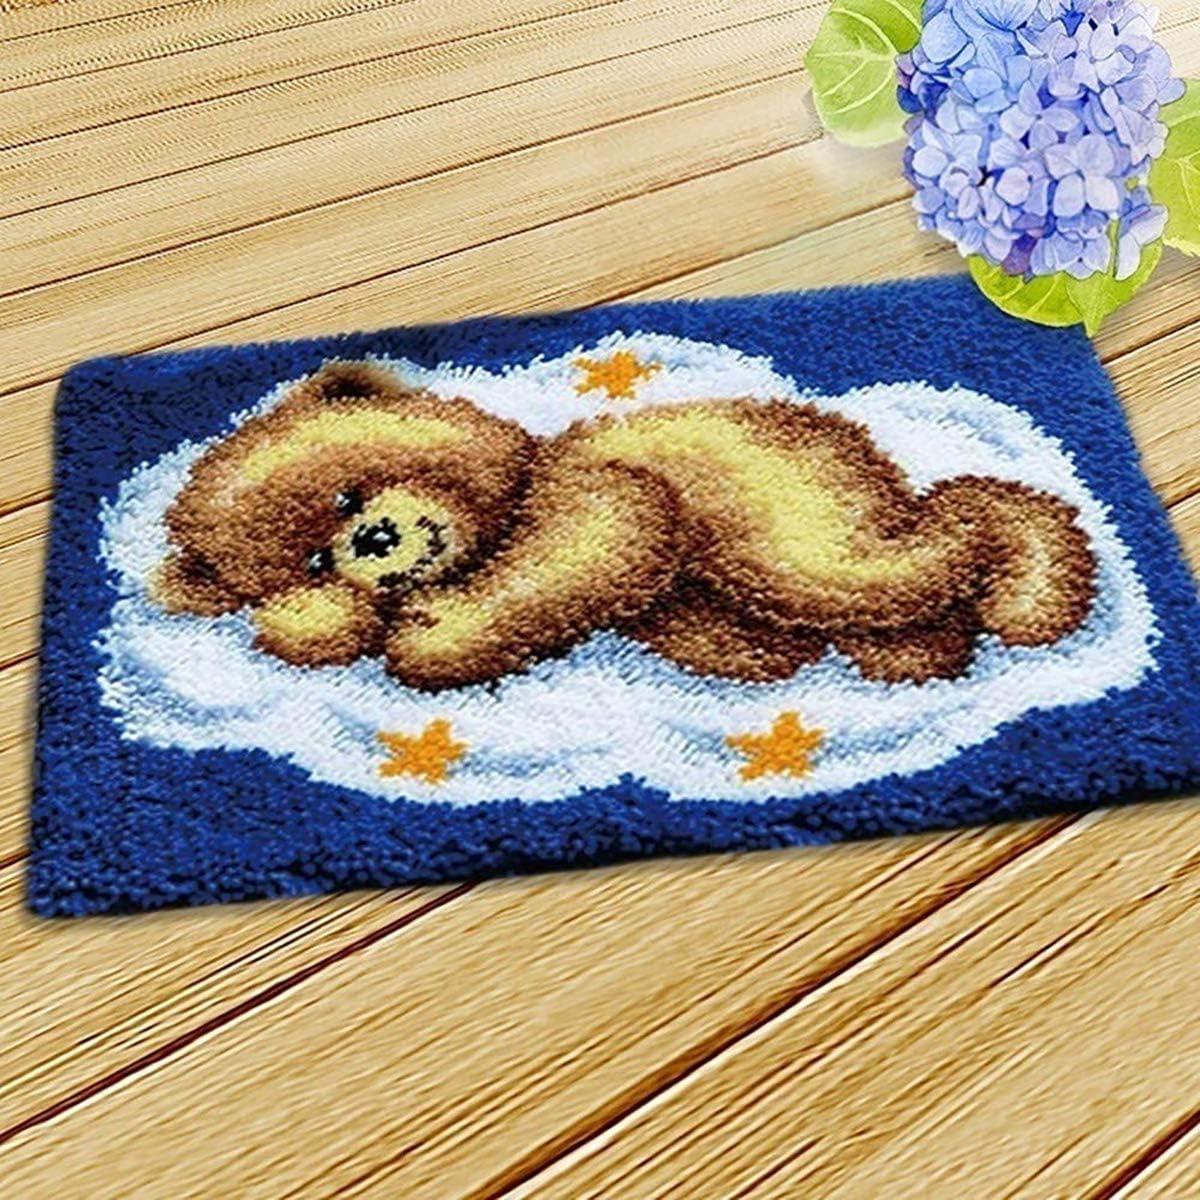 Latch Hook Kits Carpet Embroidery Cross Stitch Sofa Cushion Carpet Plush Floor Mat Embroidery Kit DIY Carpet Making Home Decor